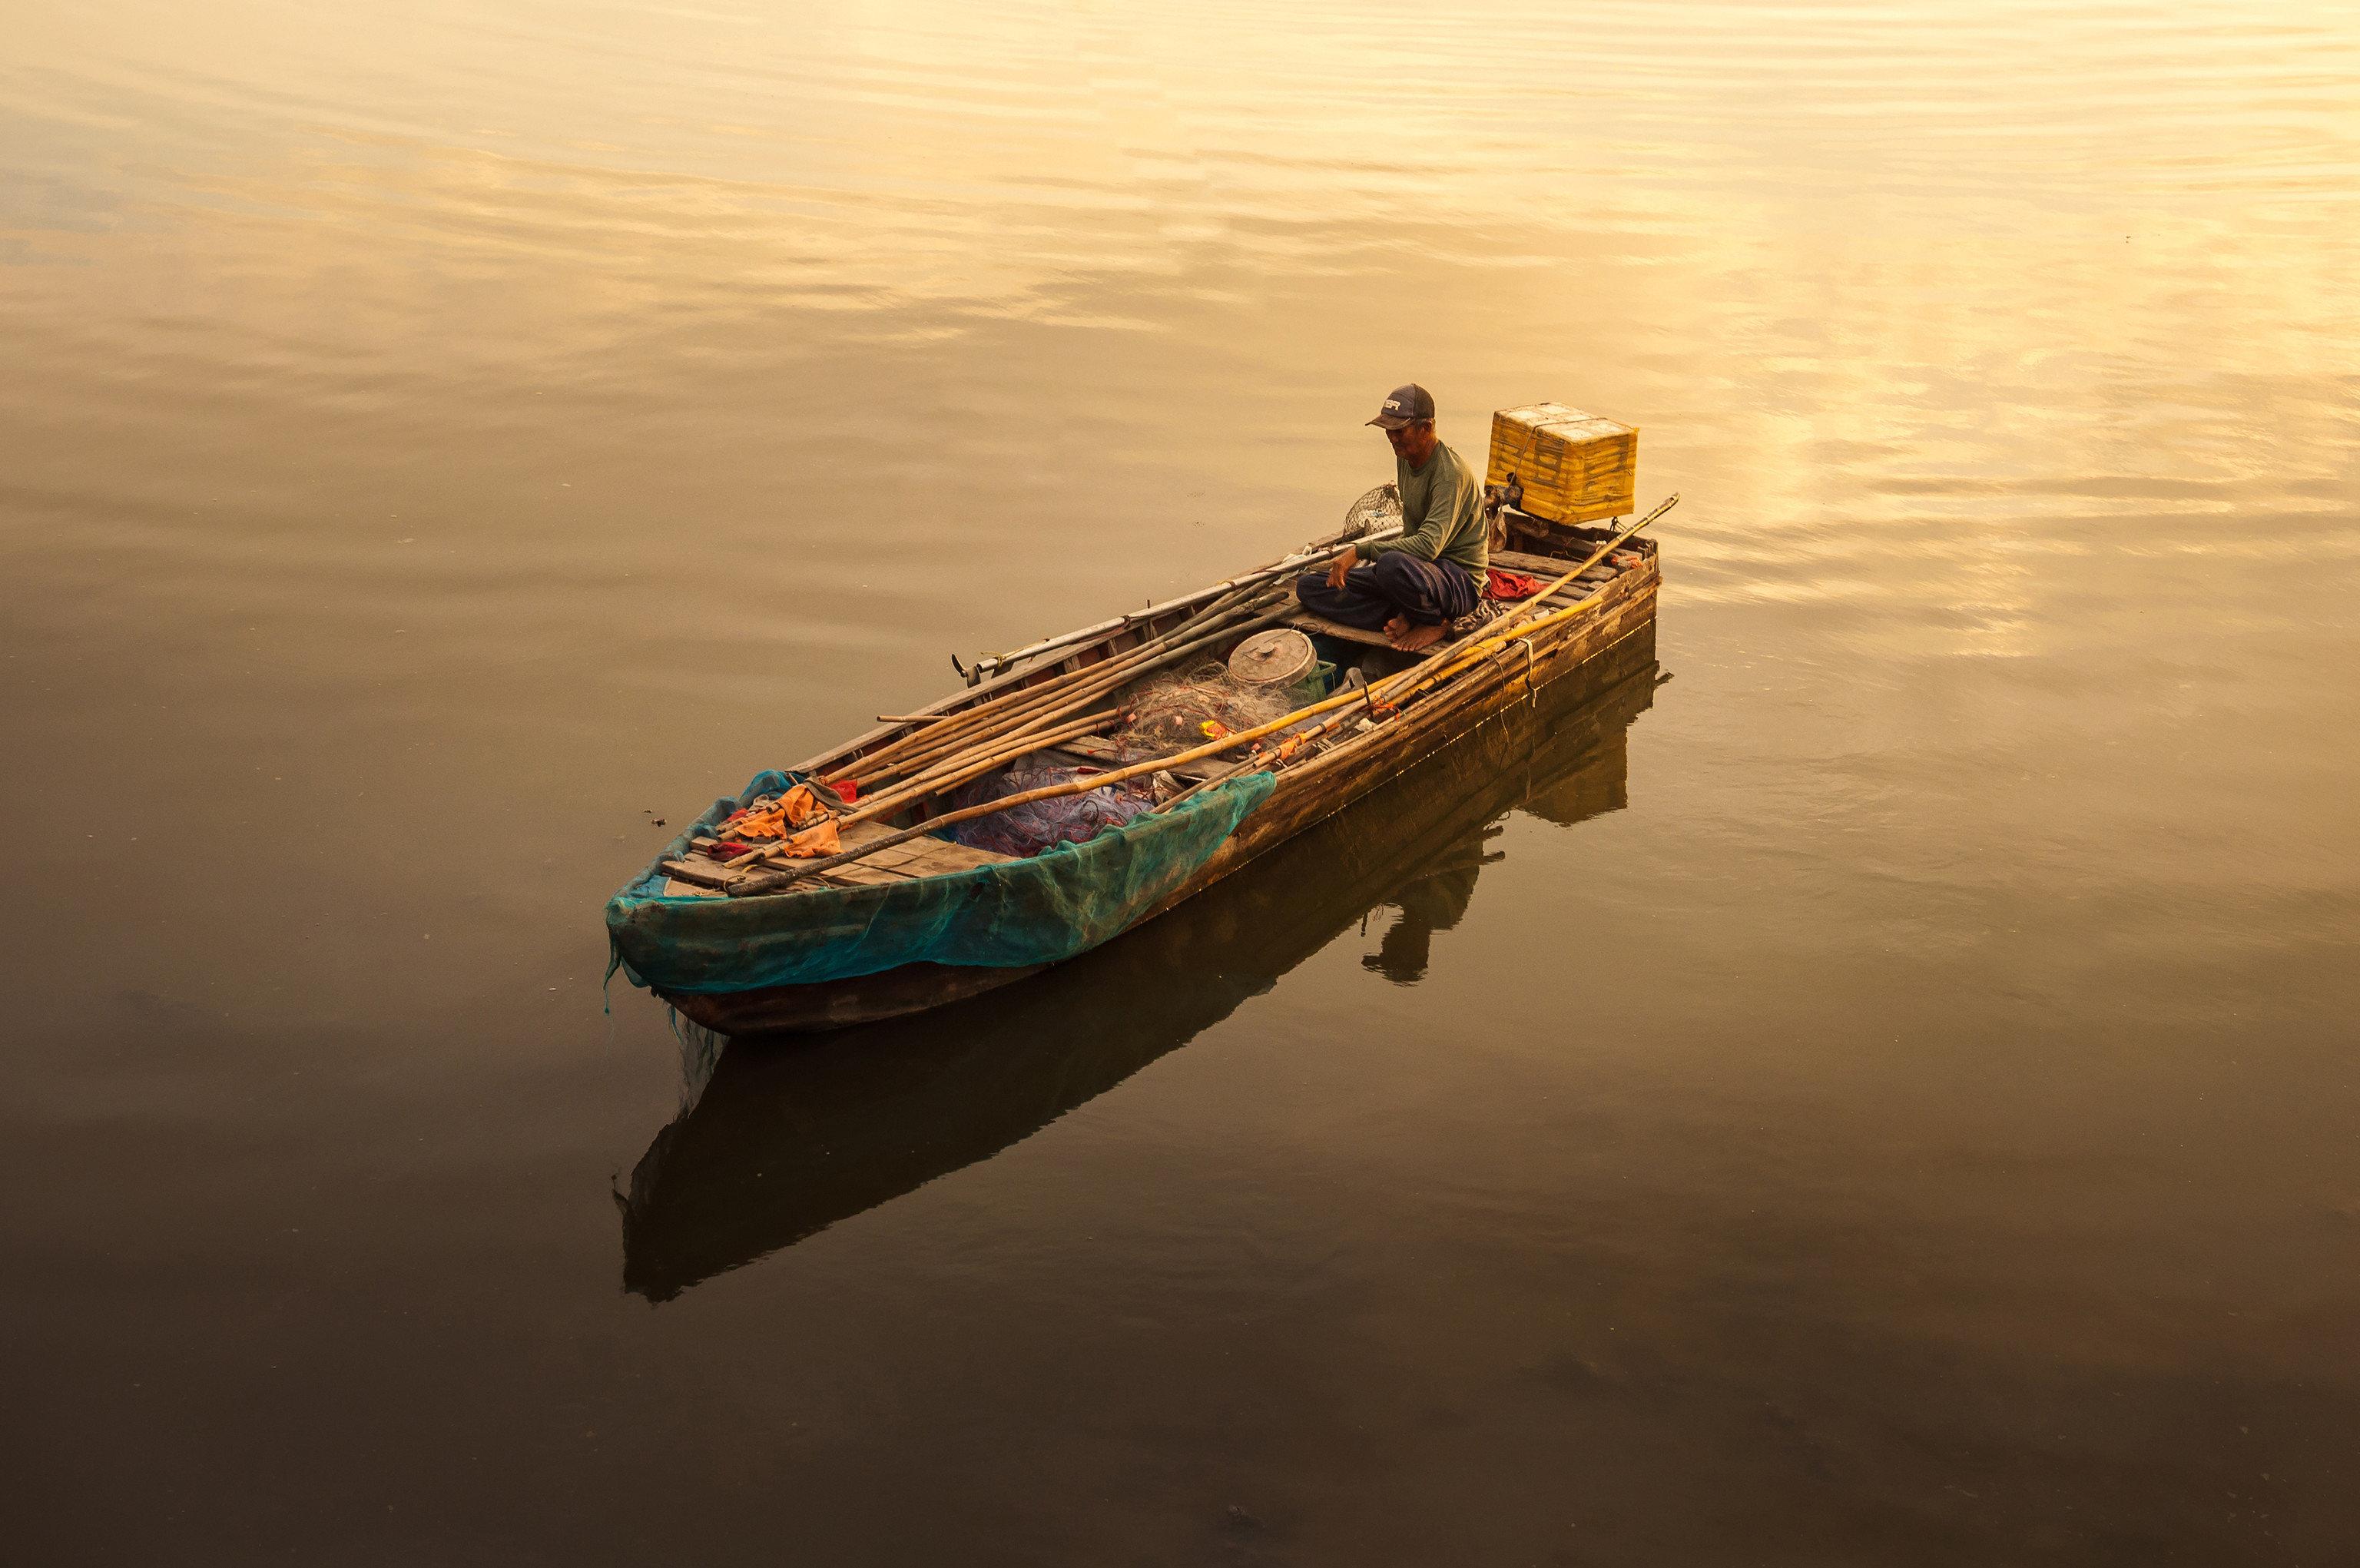 Jetsetter Guides water outdoor Boat vehicle reflection Sea watercraft rowing morning watercraft Lake floating ship wave